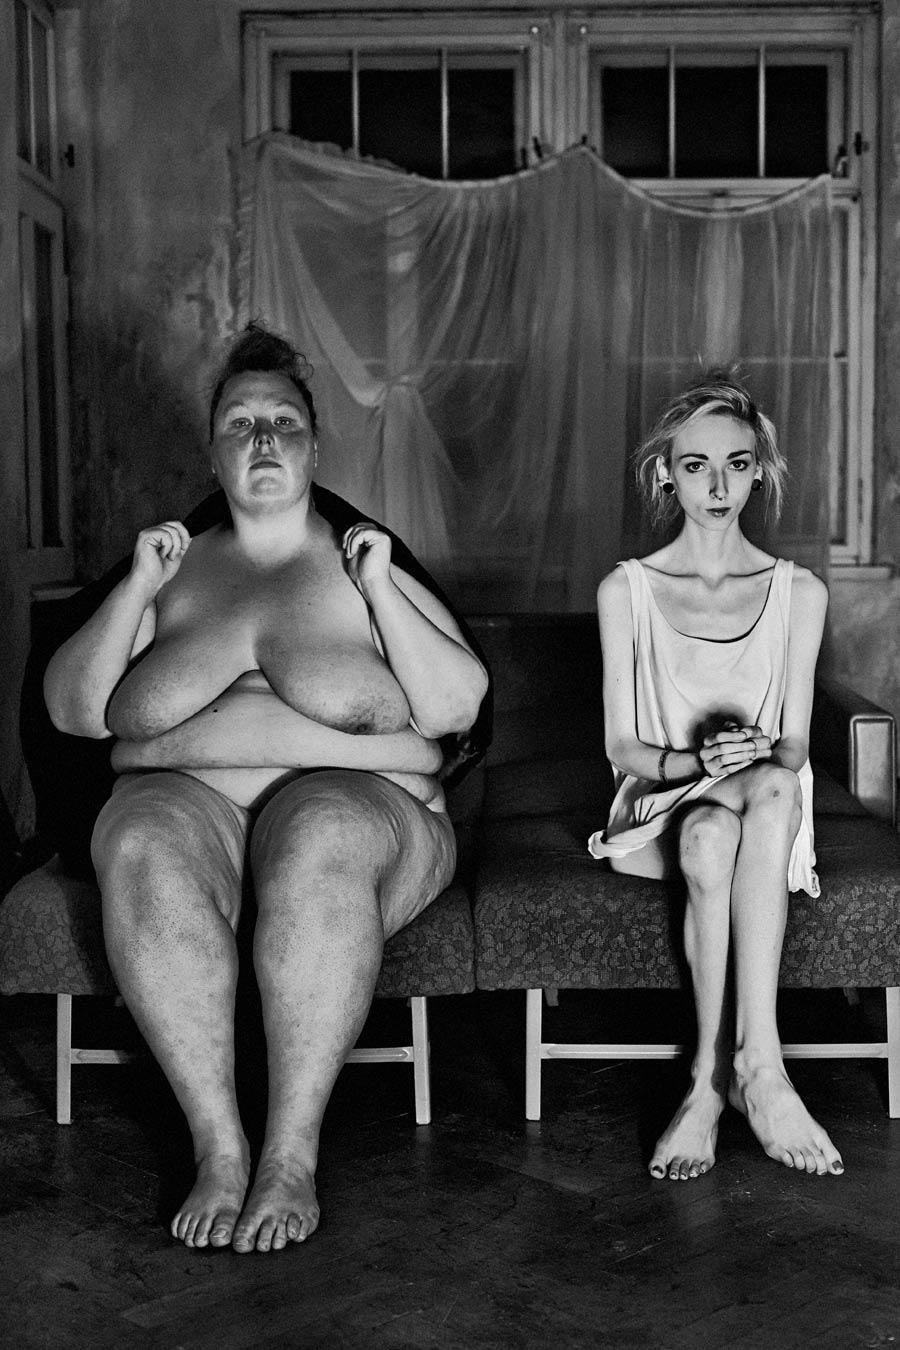 adipositas, adipös, fettleibigkeit, dicke frau, magersucht